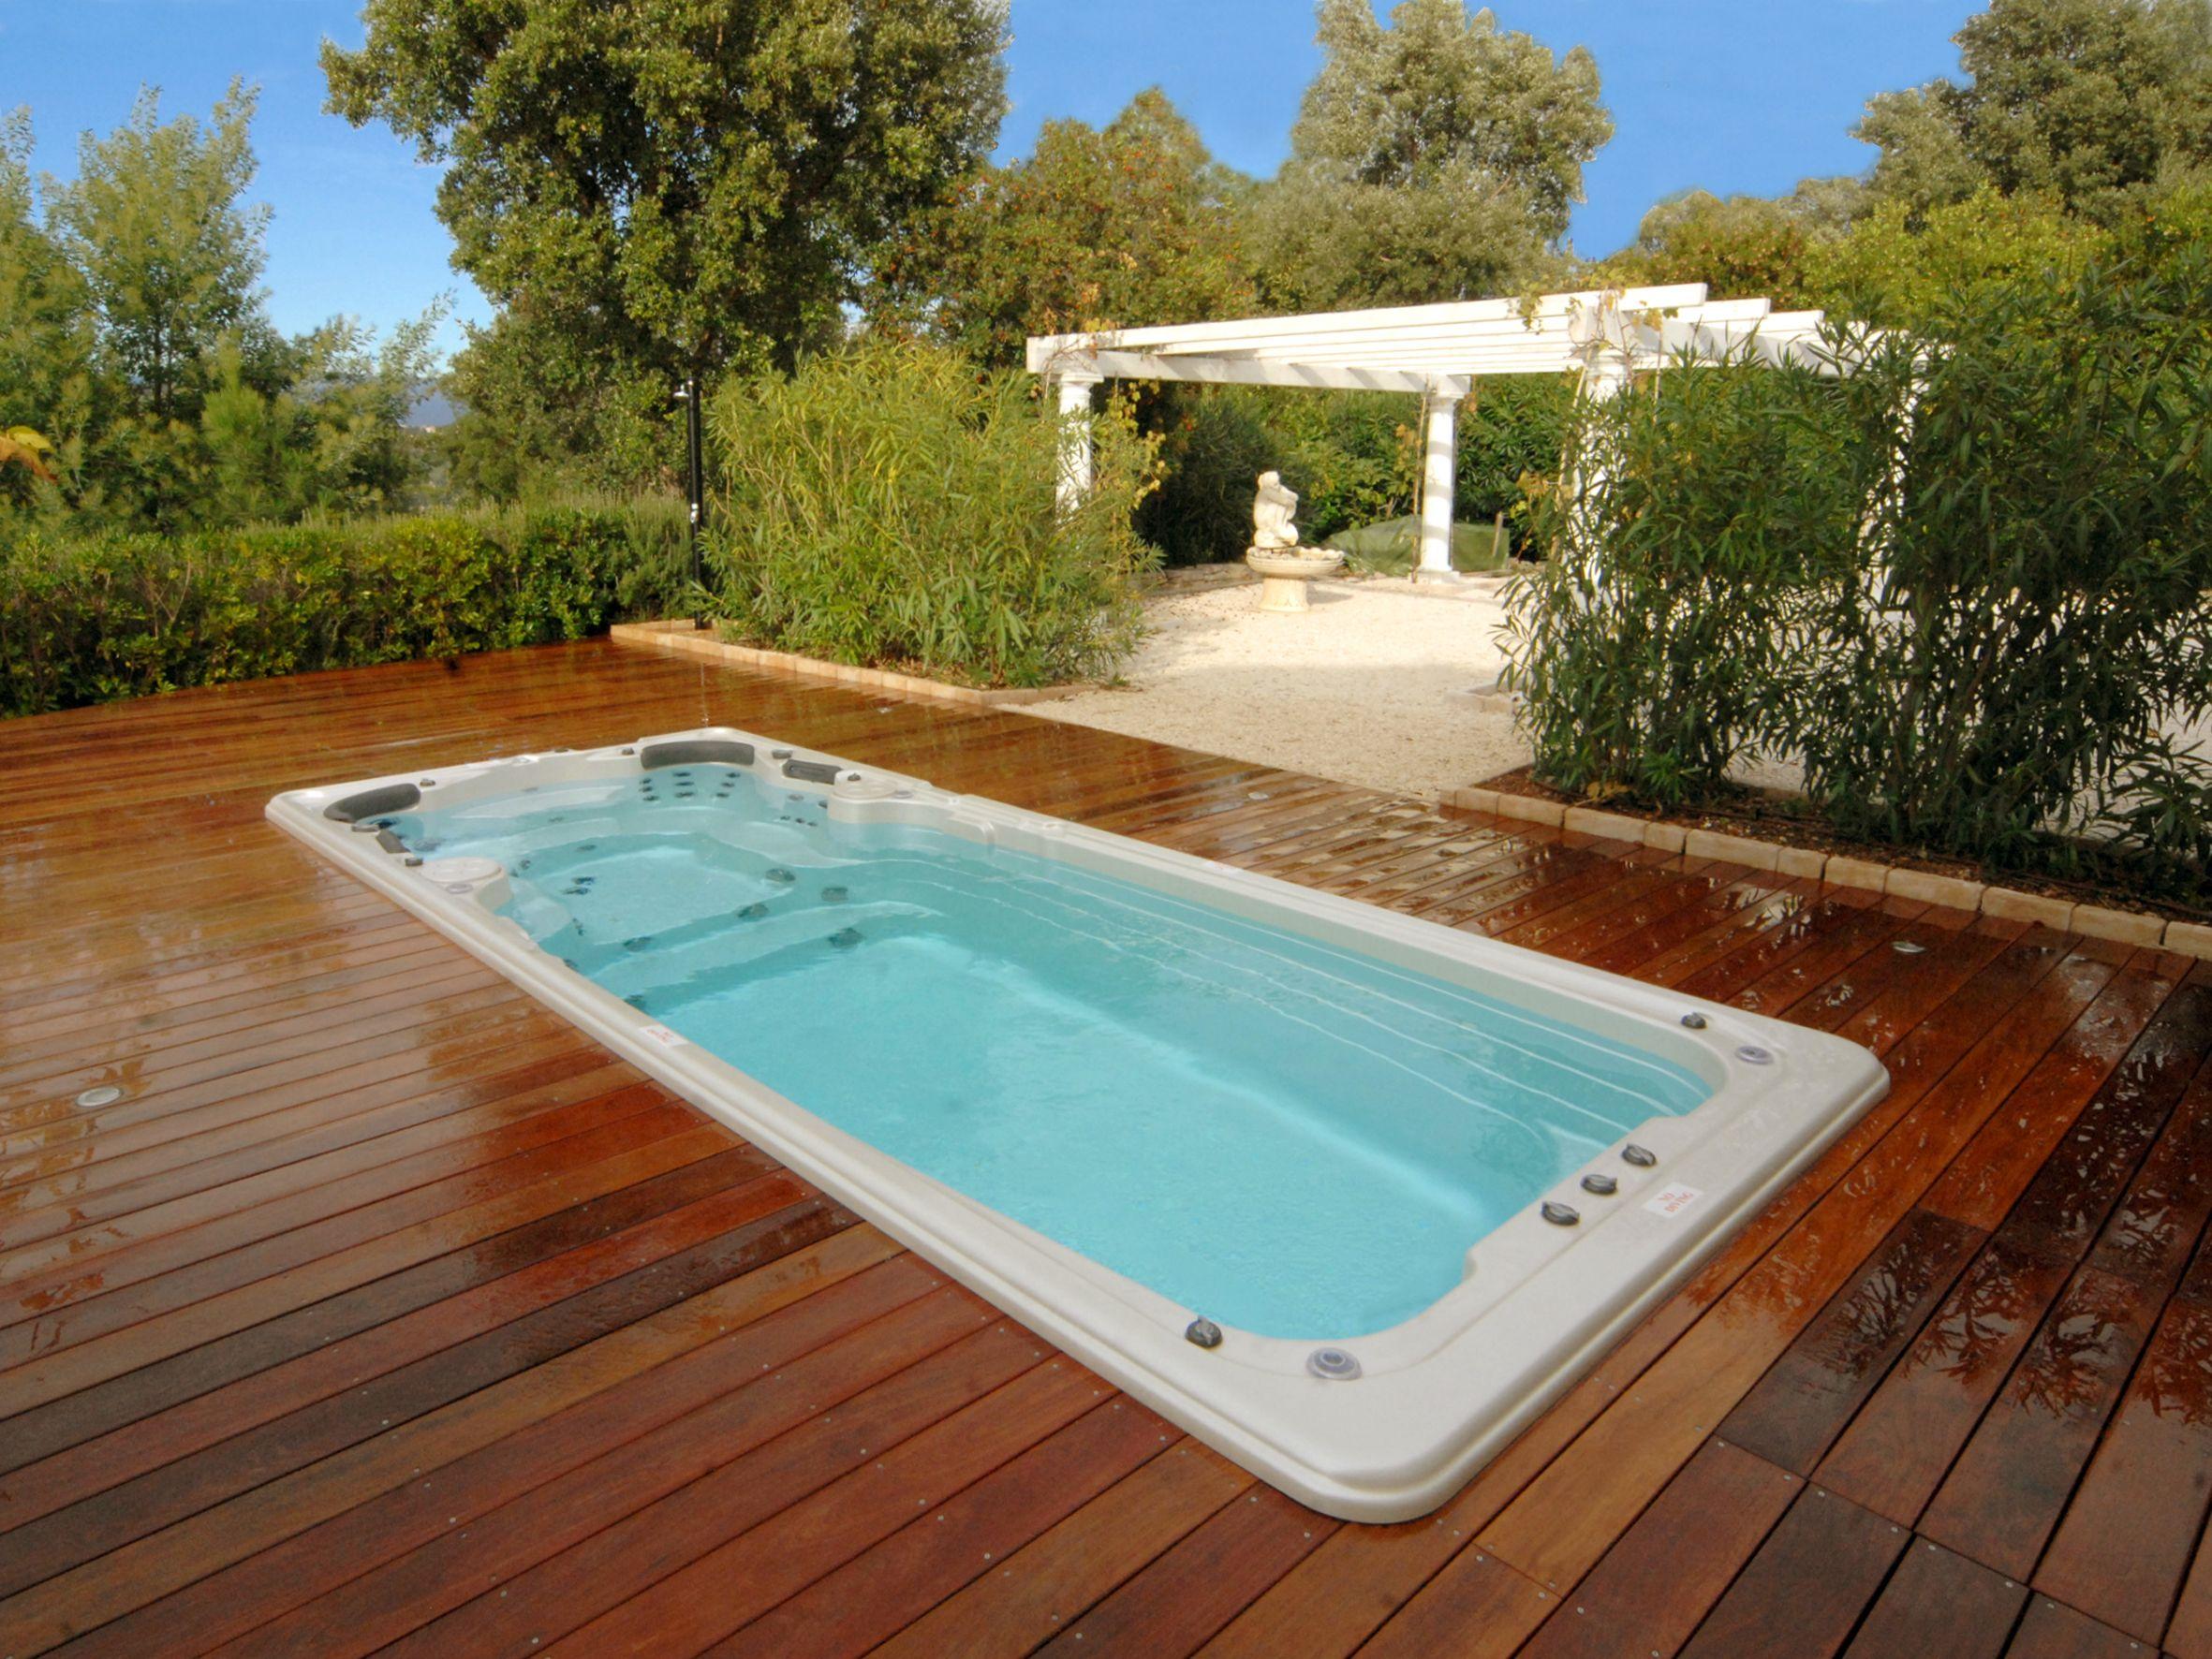 Pin By Sales On Hot Tub Garden Design Hot Tub Garden Spa